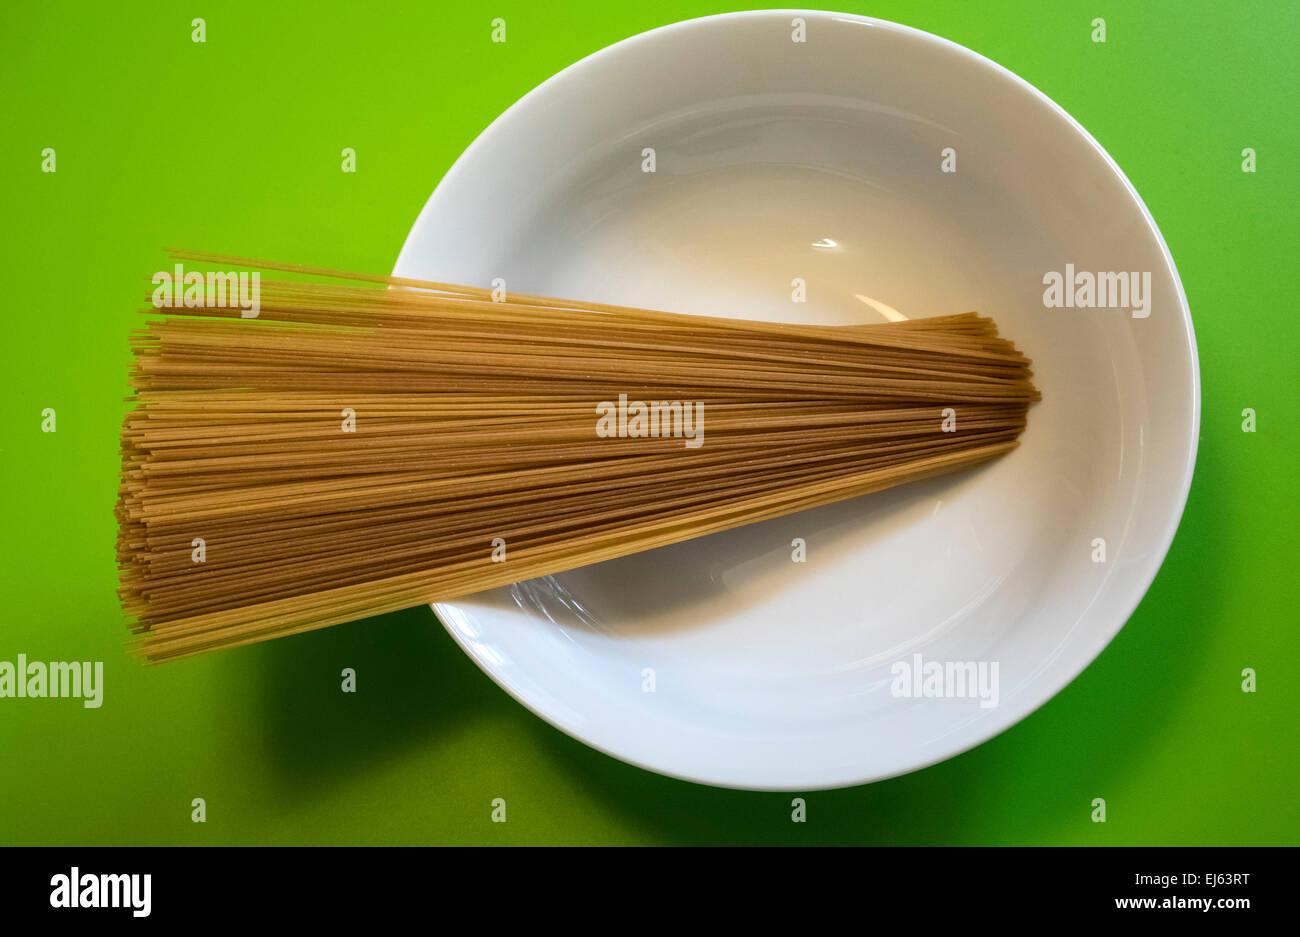 dry-whole-wheat-spaghetti-EJ63RT.jpg